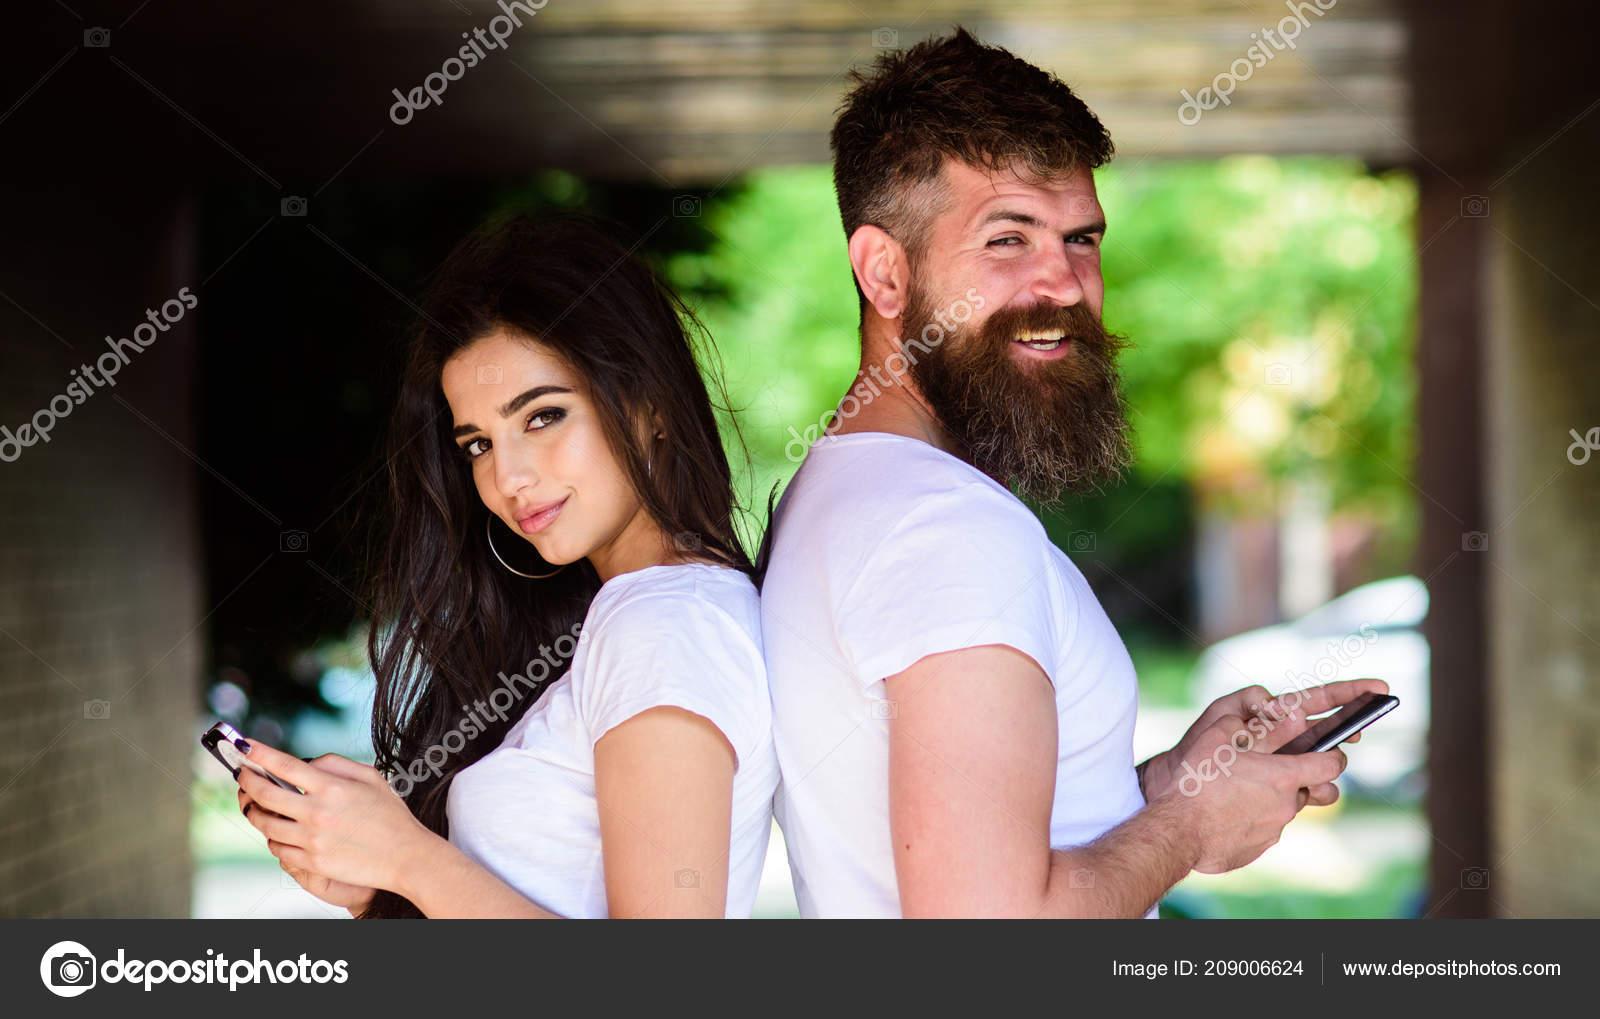 fotografie online dating podvody priateľ je na dátumové údaje lokalít